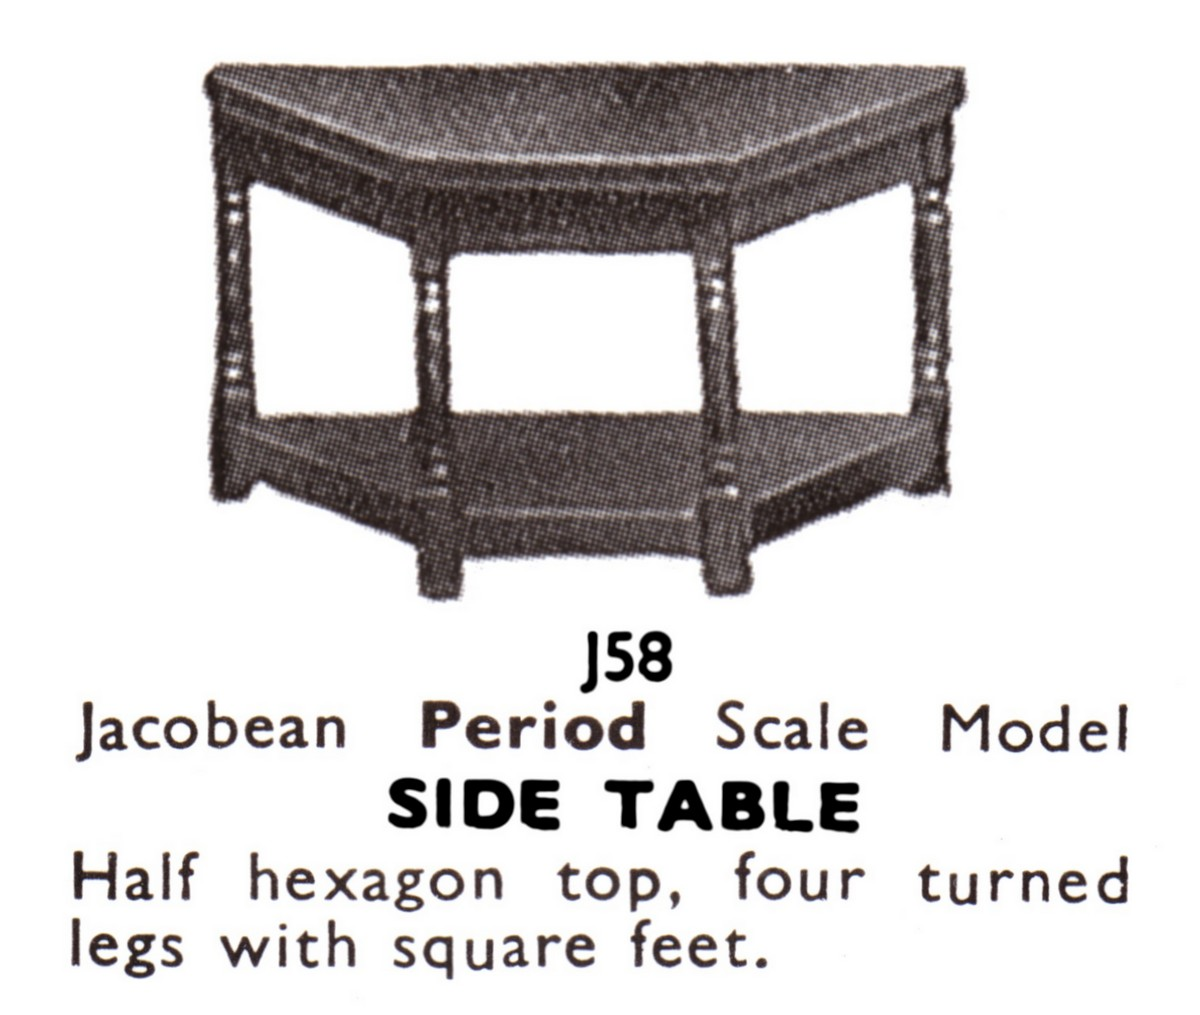 Category Period Scale Model Dolls Furniture